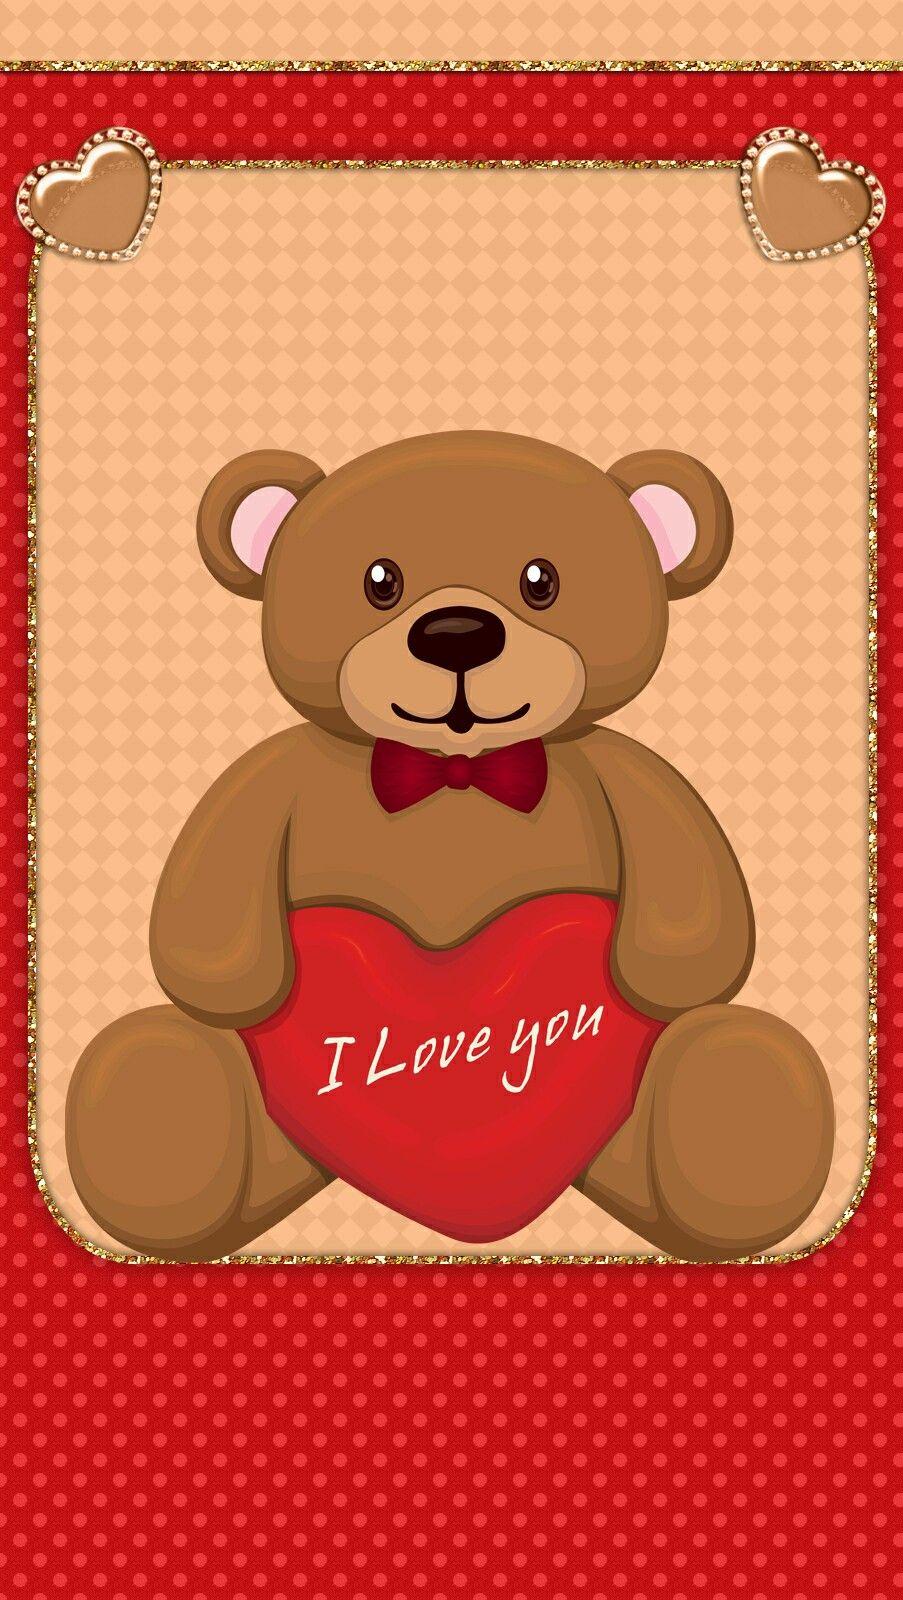 Amazing Cute Cartoon Love Wallpaper For Iphone - e695e51104b89a64f3315f1320f0b4cb  You Should Have_989689.jpg